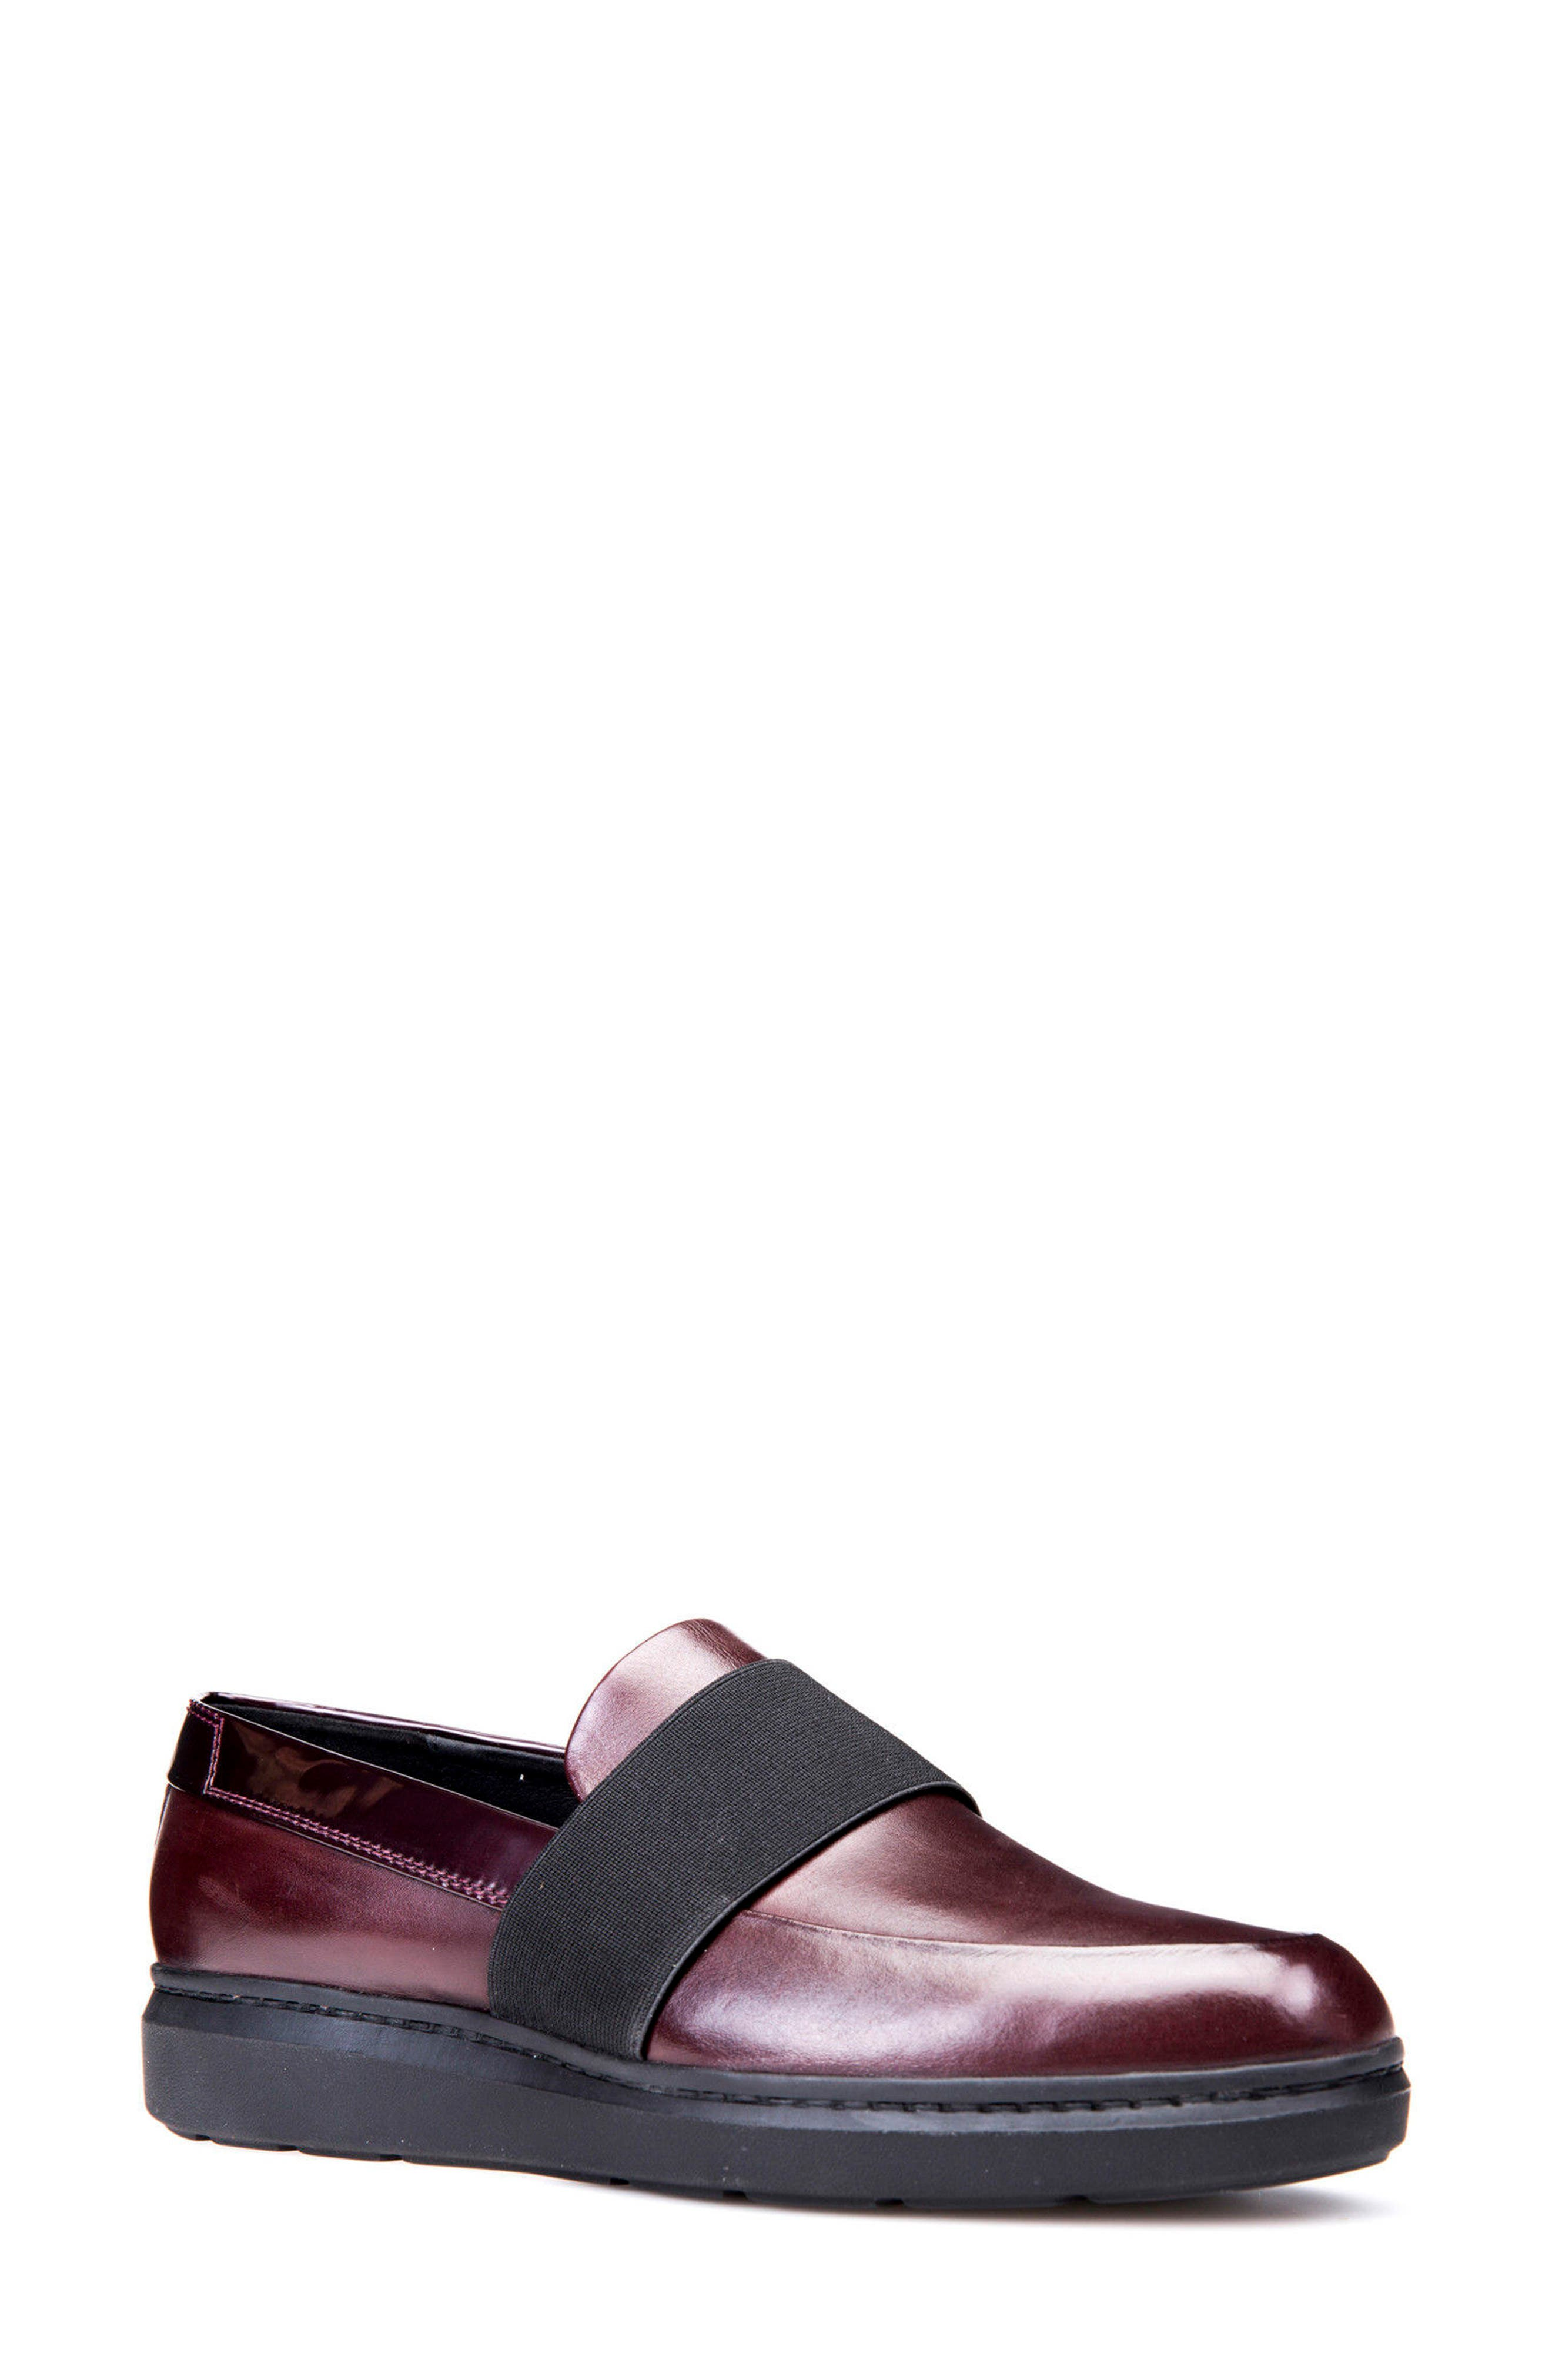 Jerrica Loafer,                         Main,                         color, Dark Burgundy Leather